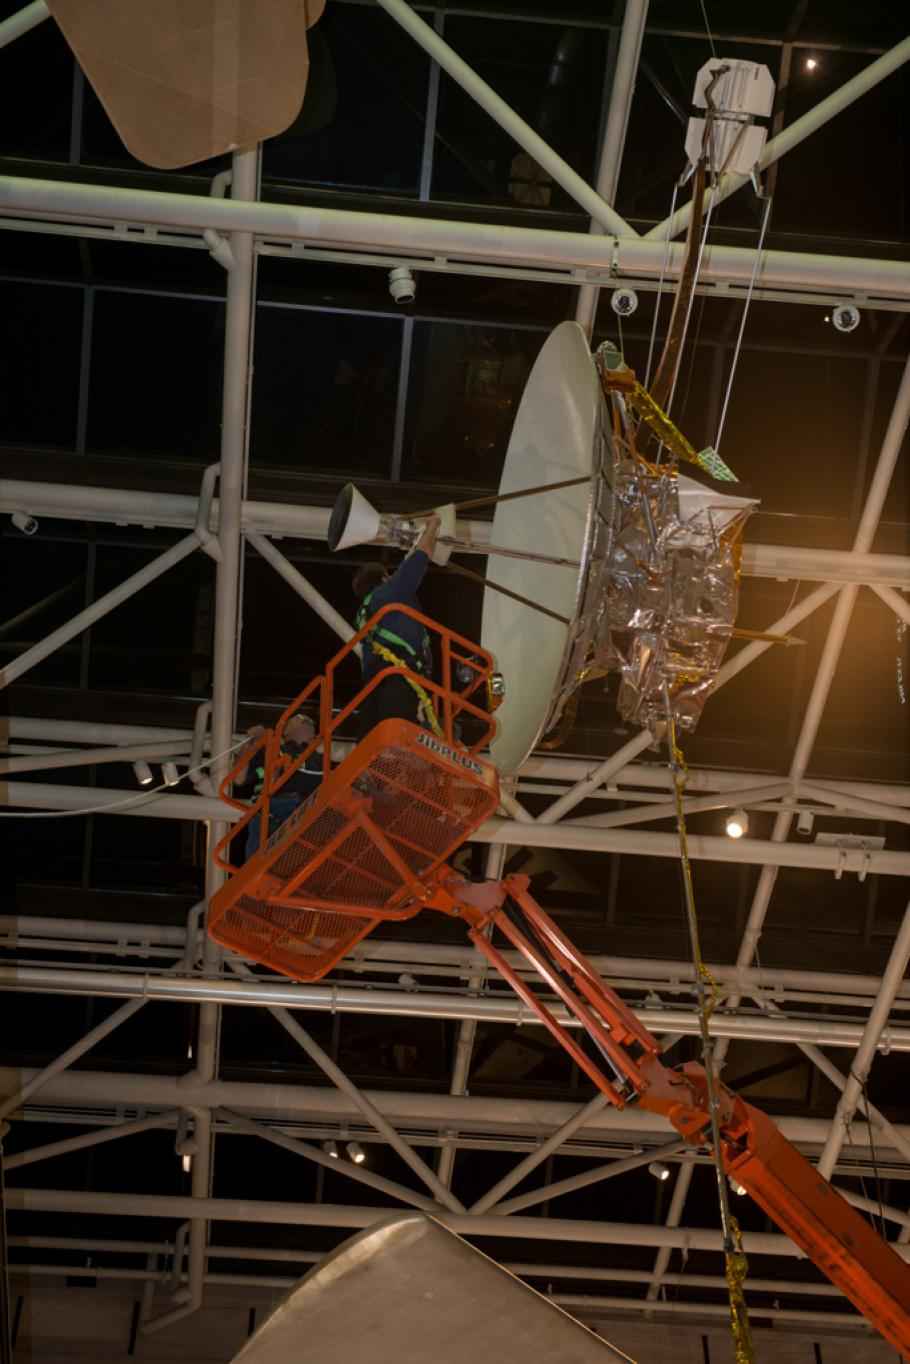 Moving Pioneer 10 / 11